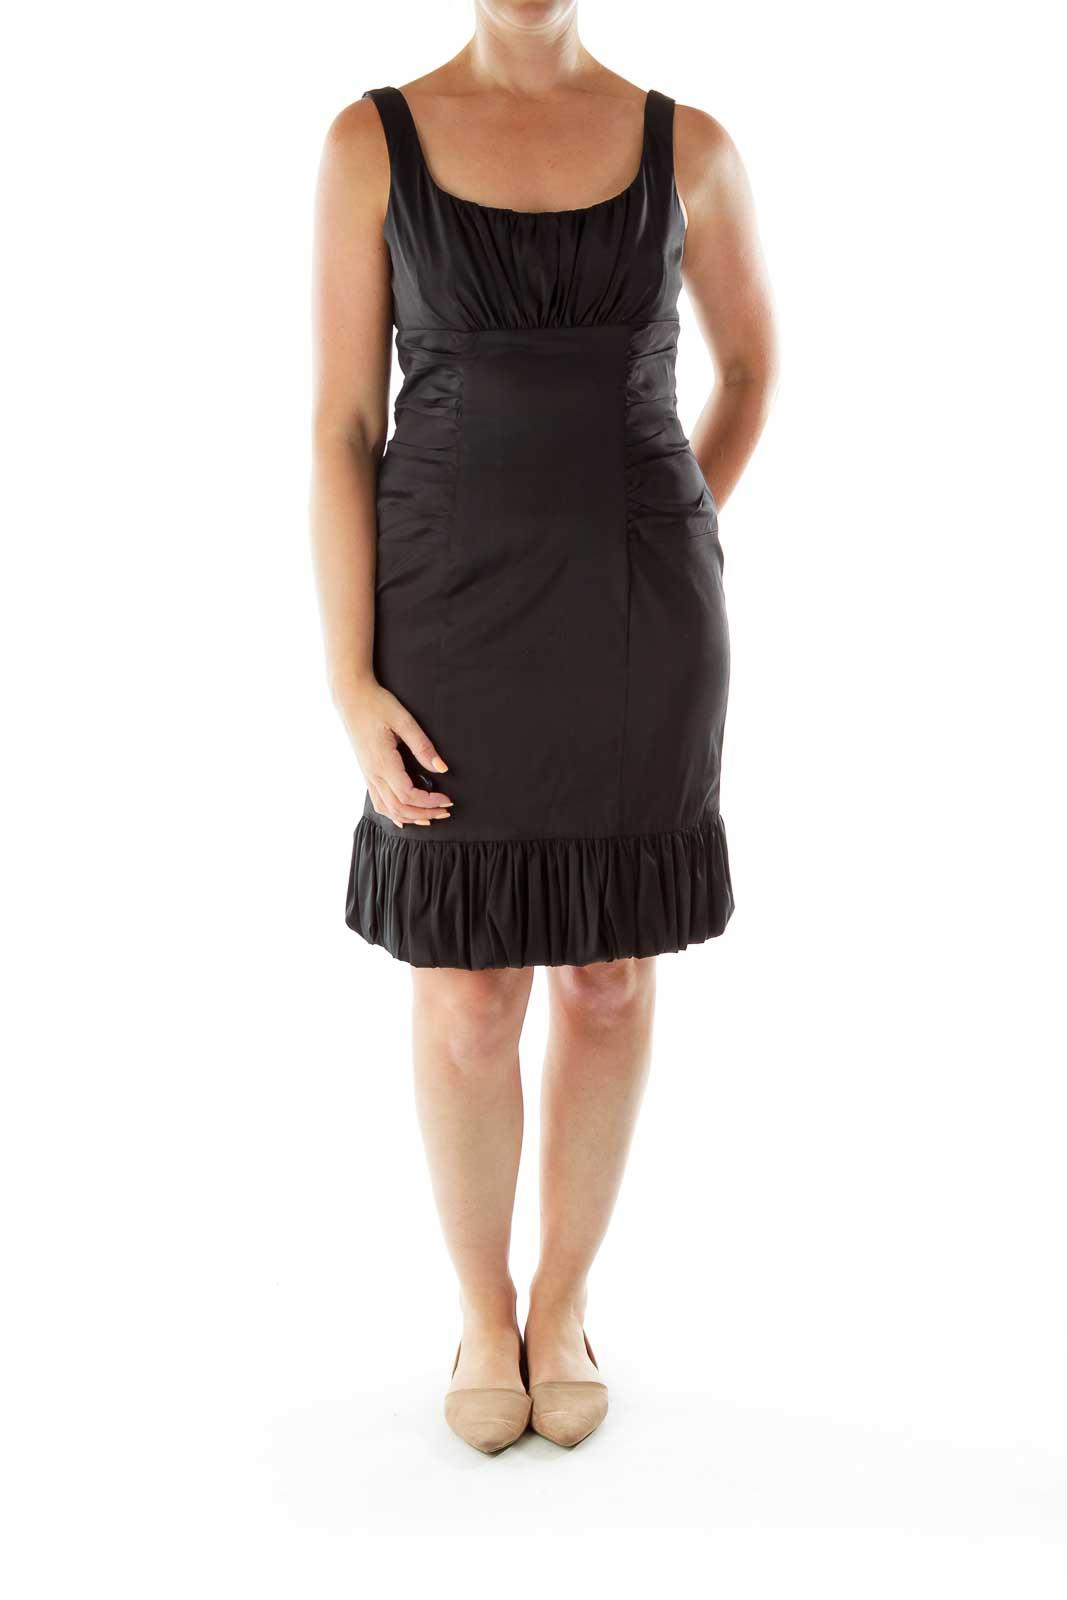 Black Sleeveless Puffy Dress